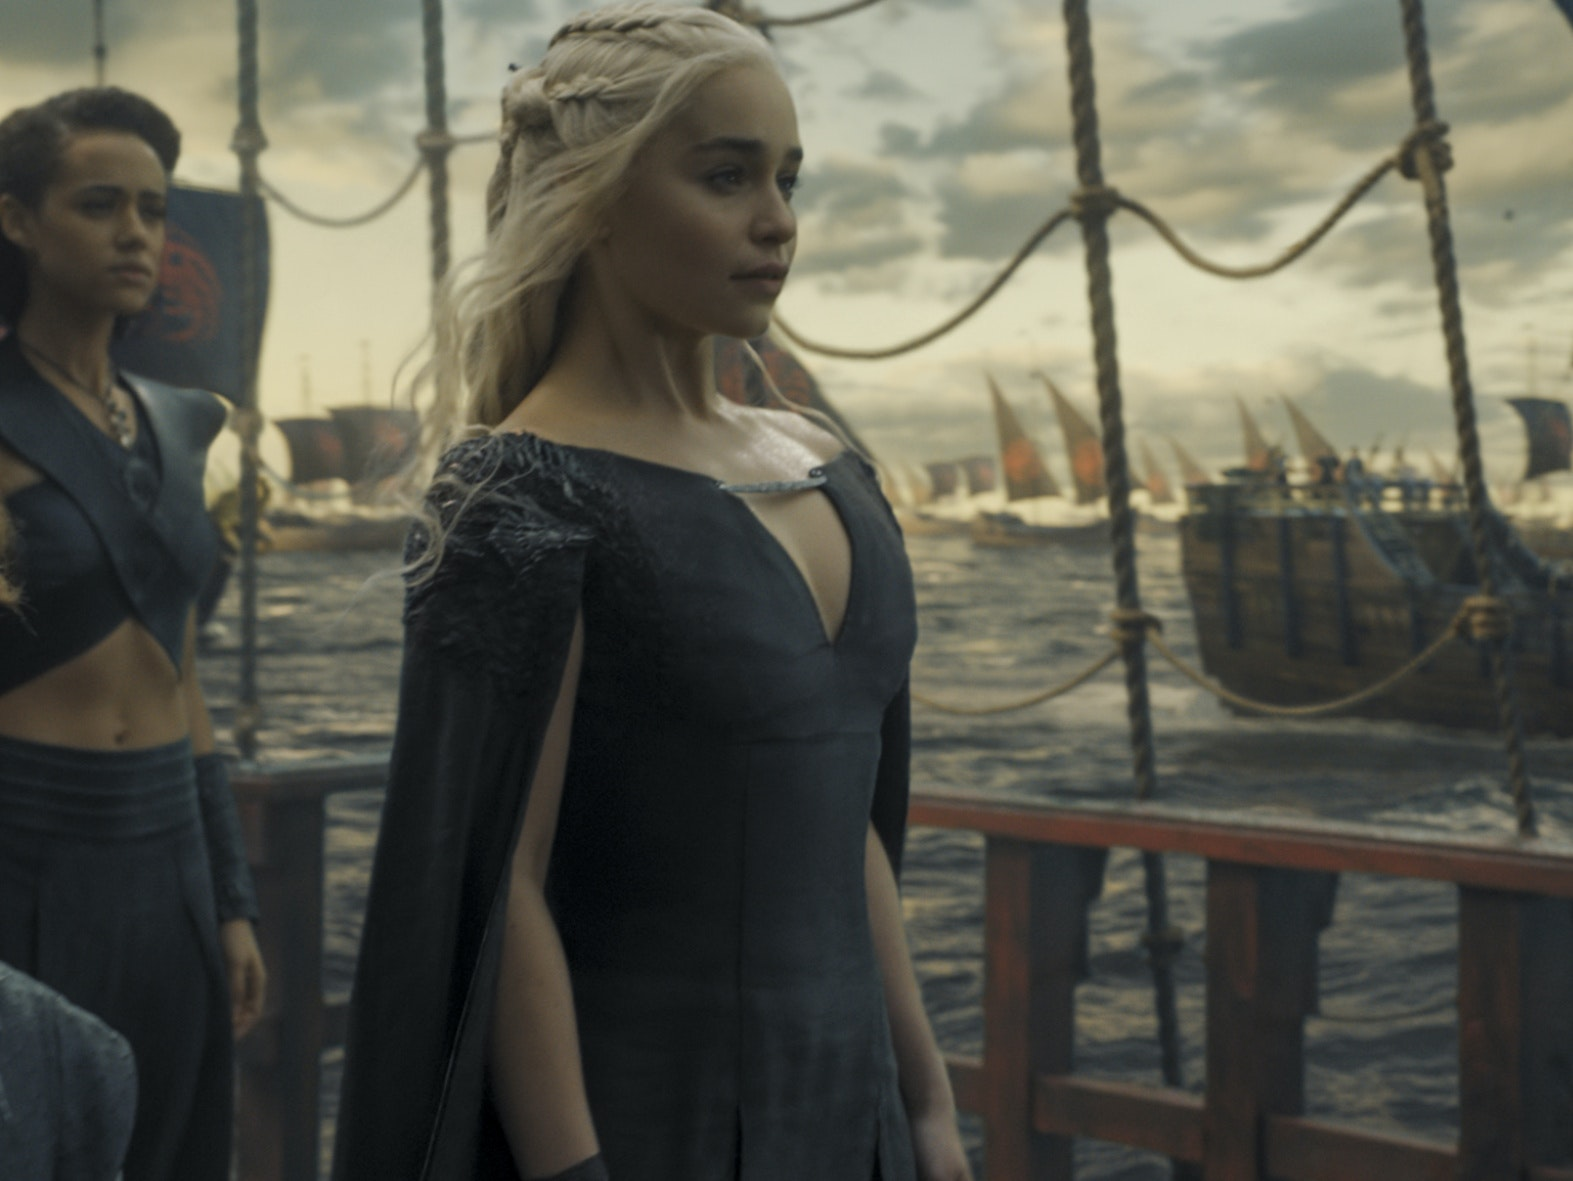 Jon and Daenerys Will Fight or Hook Up in 'GoT' Season 7